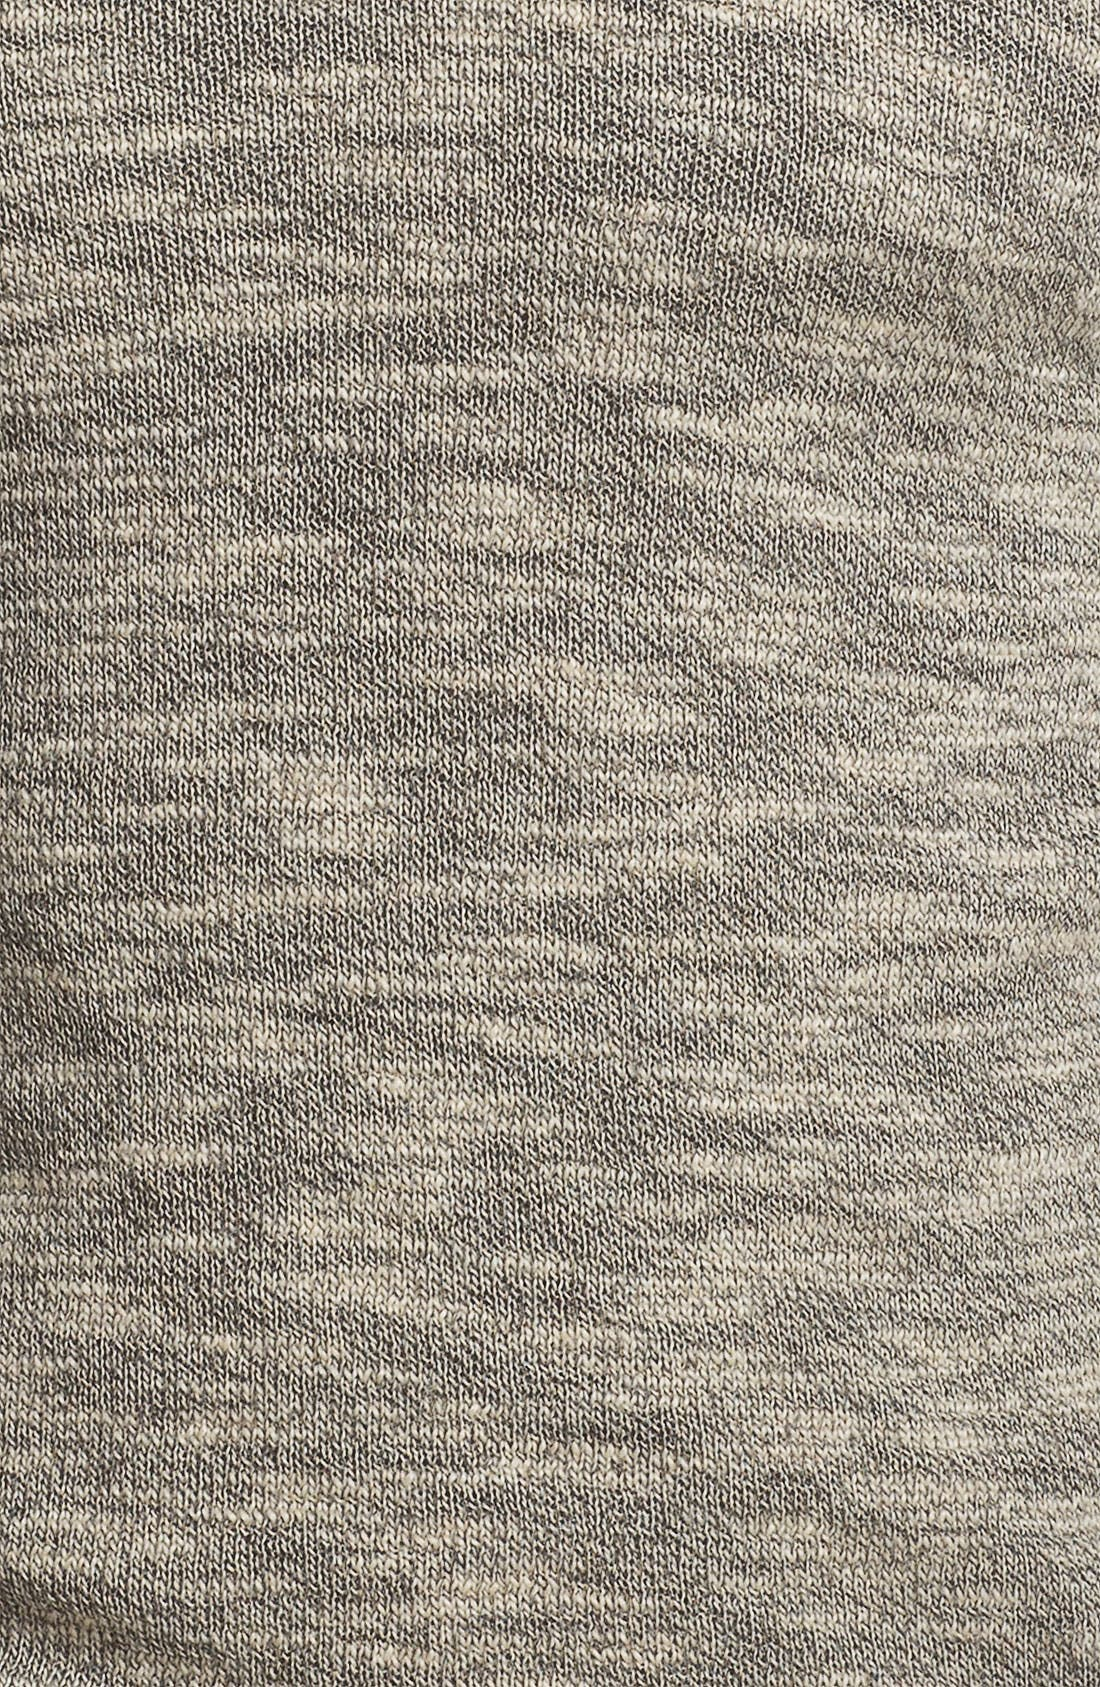 Crewneck Silk Blend Sweater,                             Alternate thumbnail 3, color,